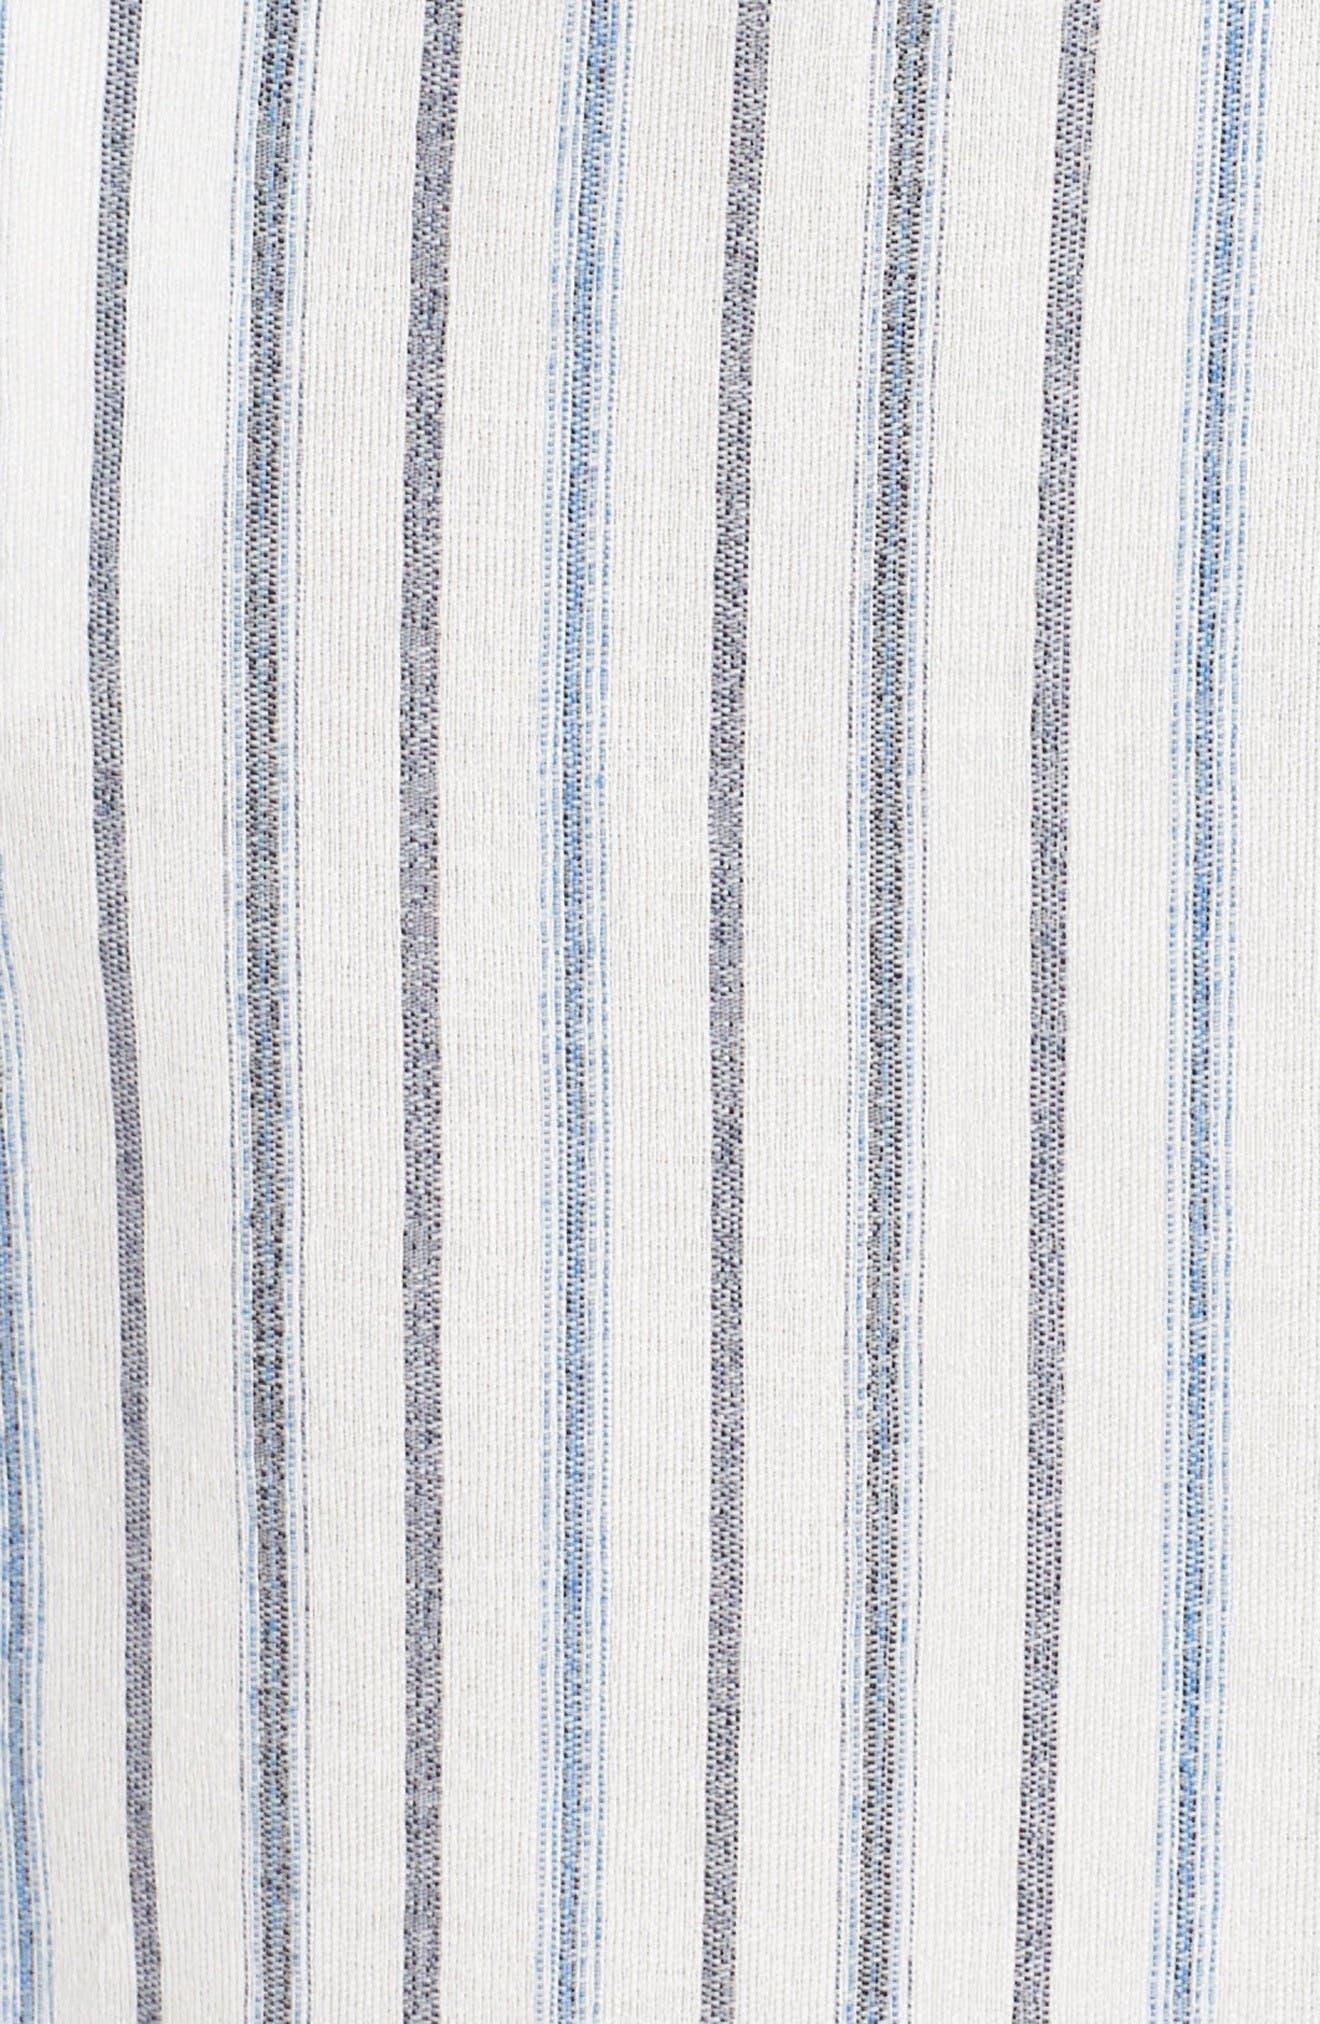 Alexis Off the Shoulder Dress,                             Alternate thumbnail 6, color,                             White Combo